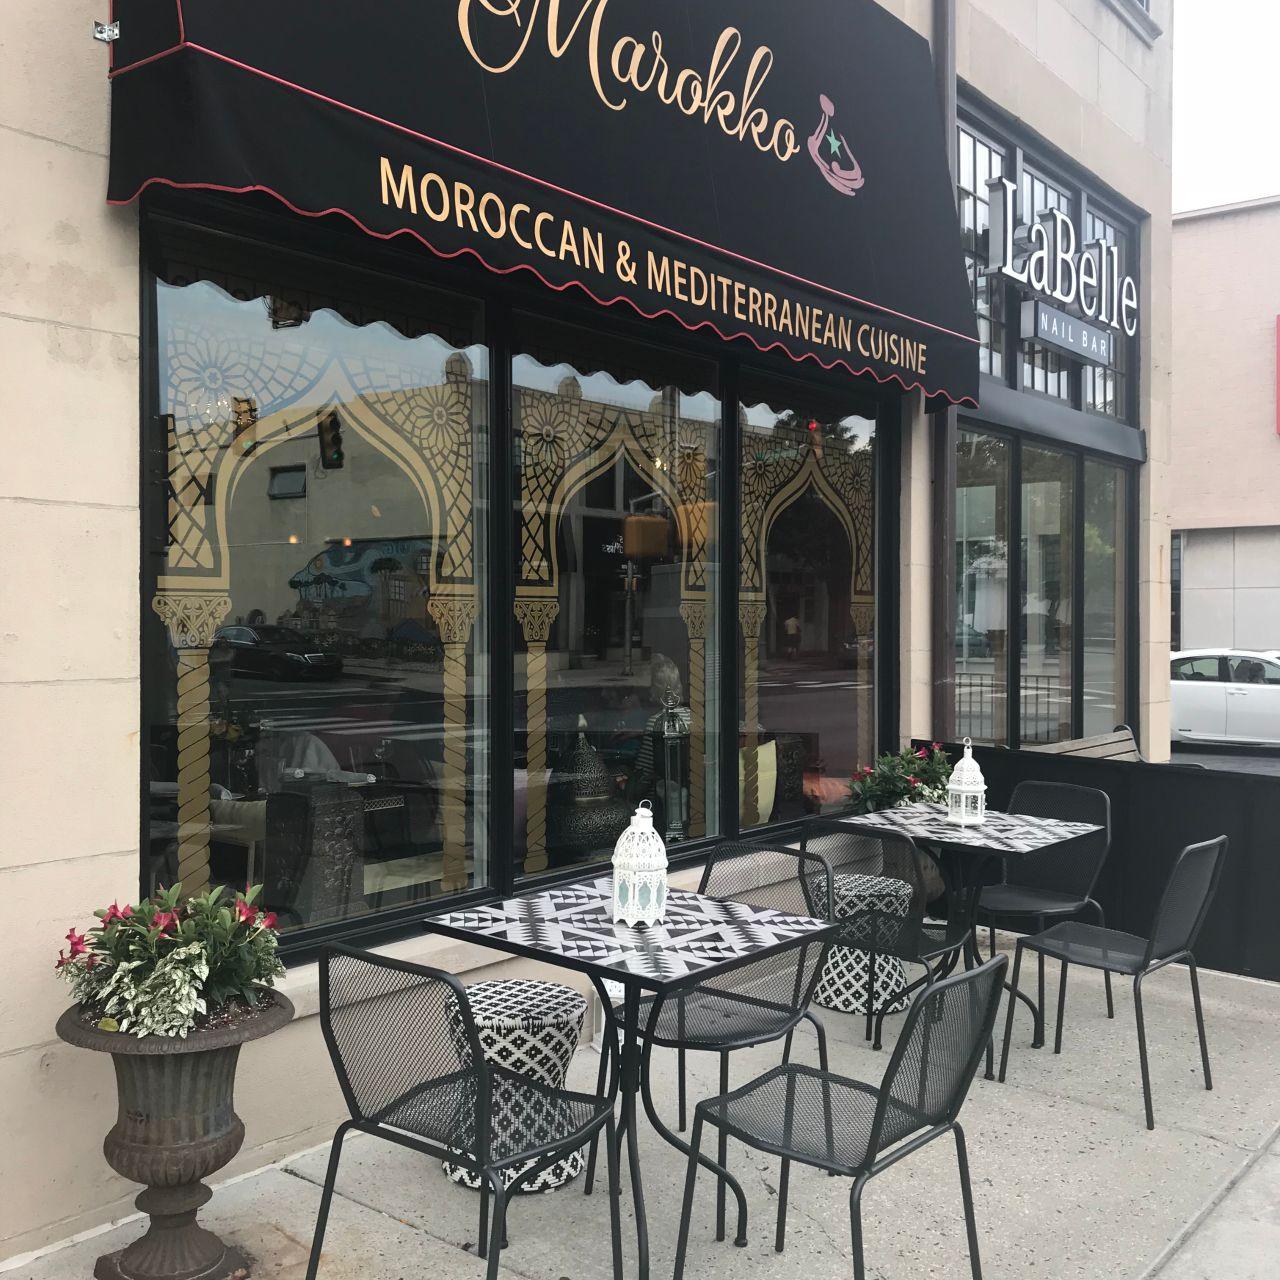 Marokko Restaurant Ardmore Pa Opentable